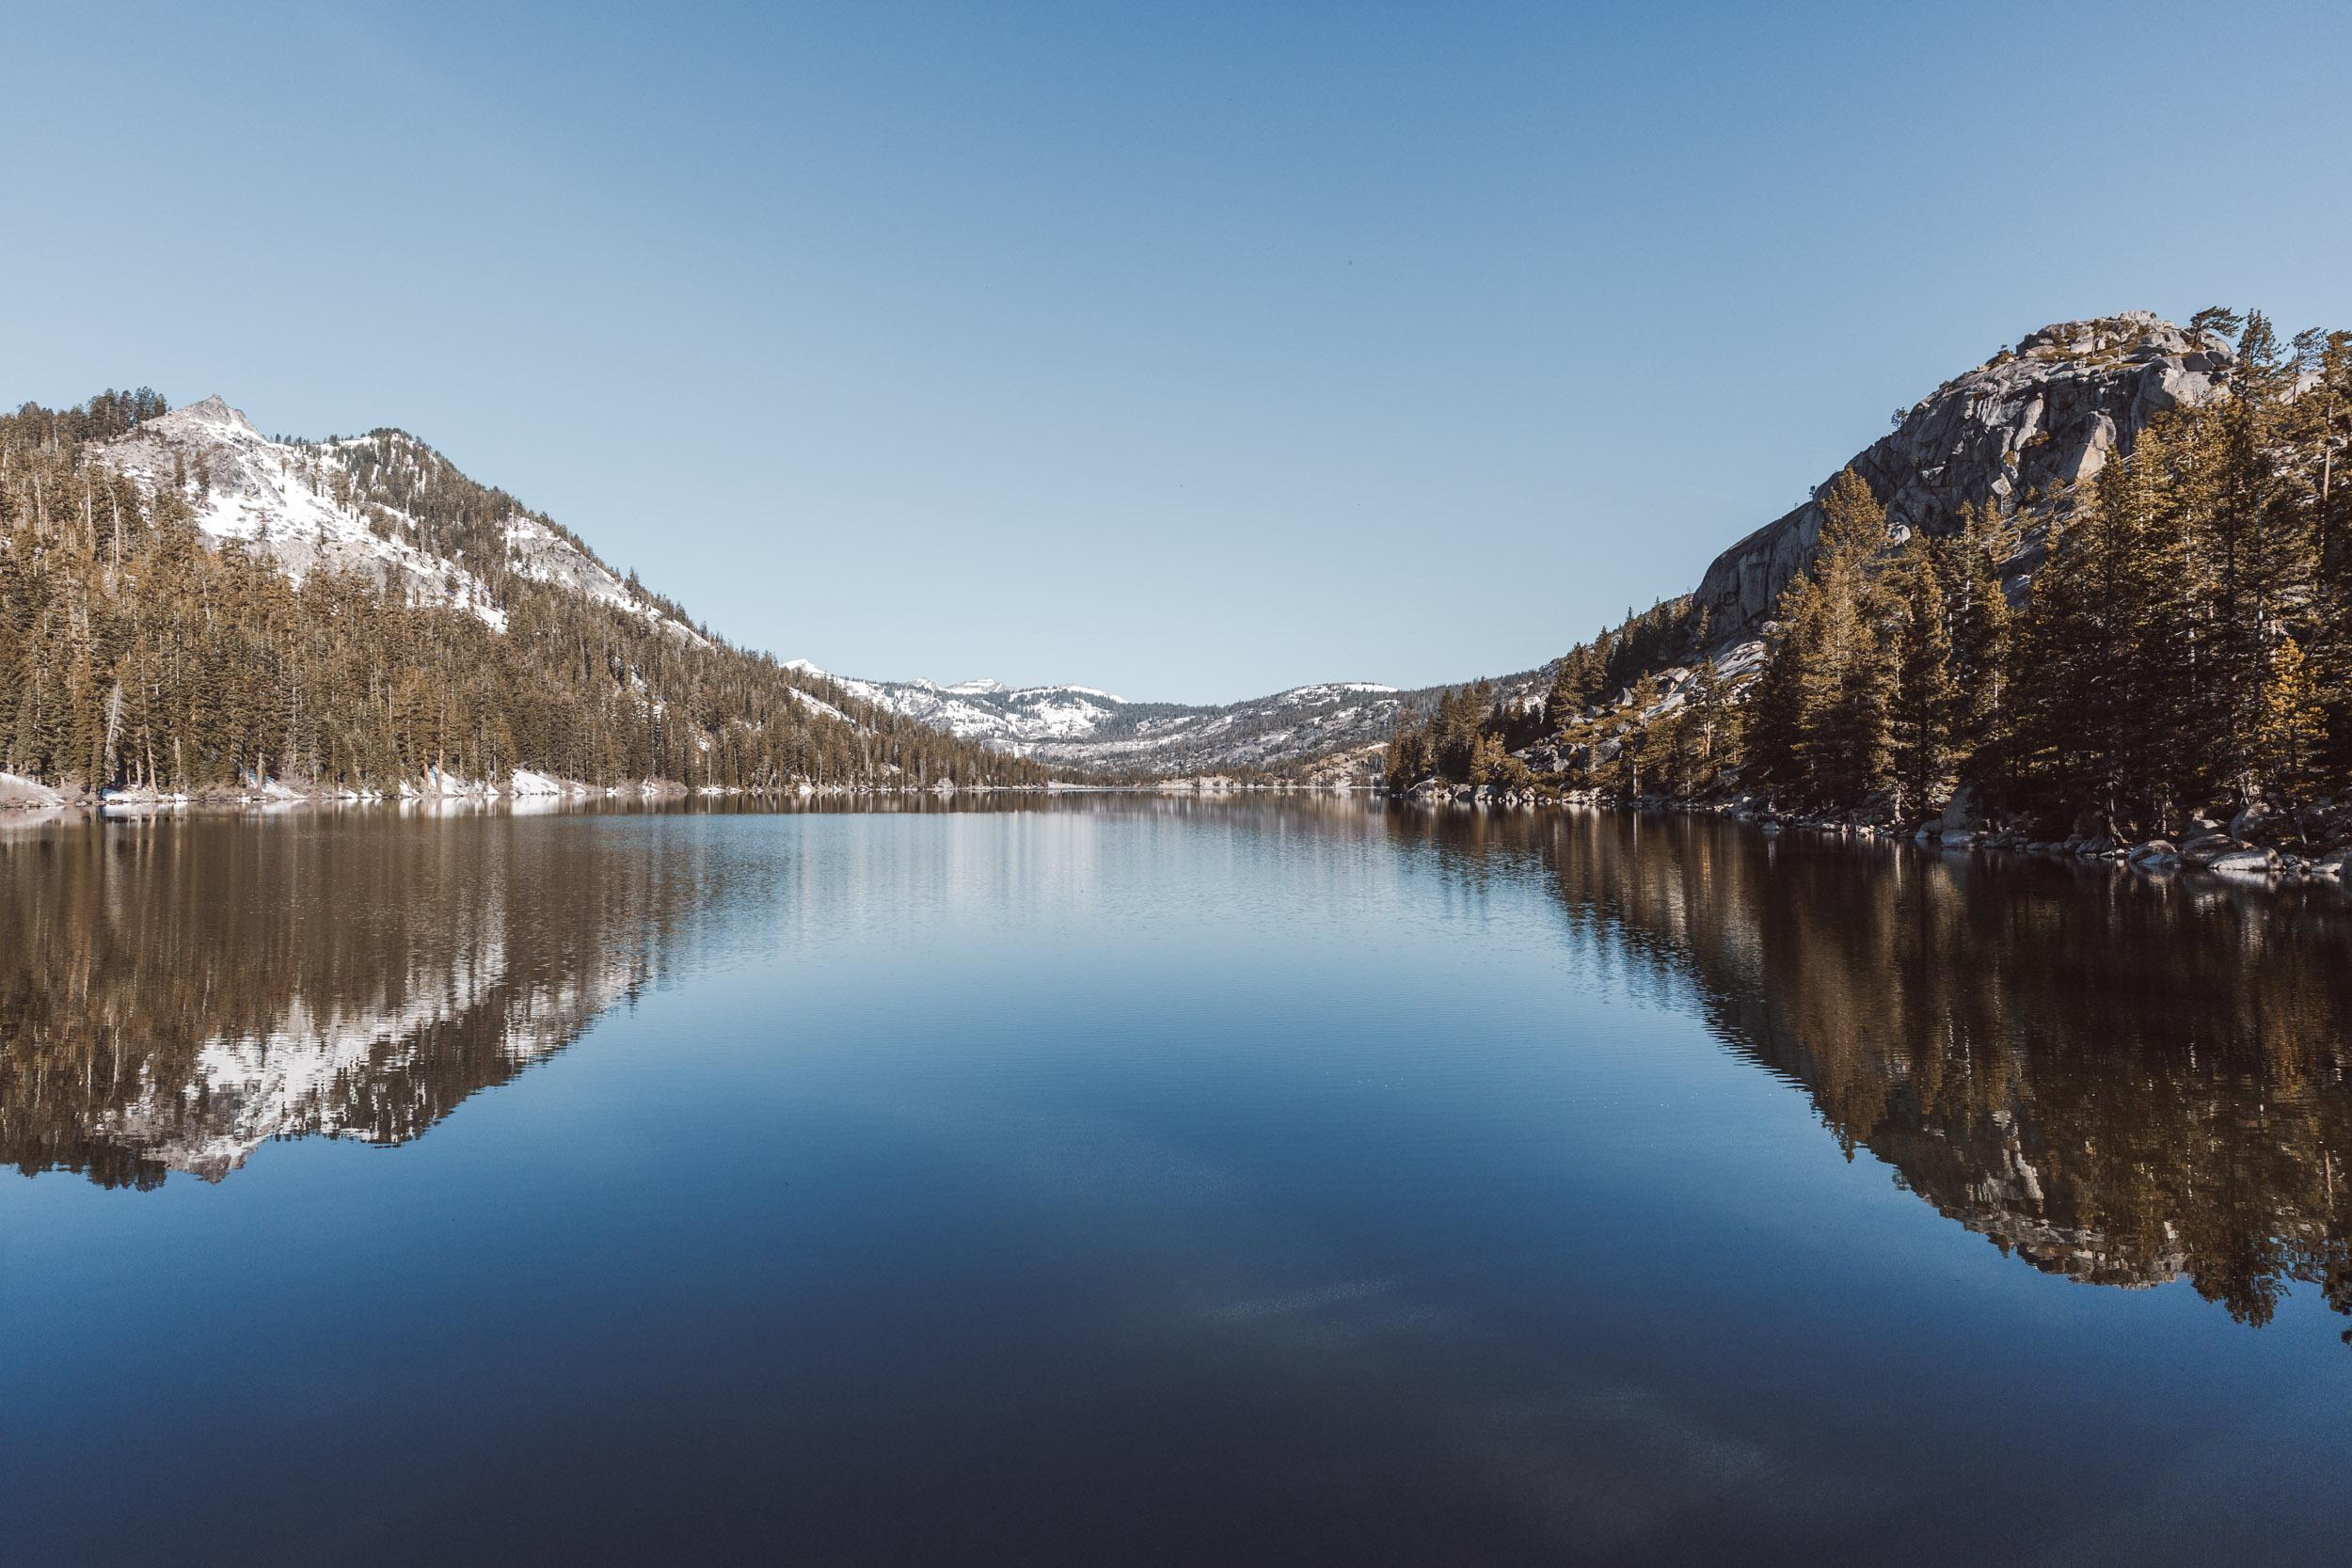 echo-lake-reflection-hike-and-shoot-1.jpg